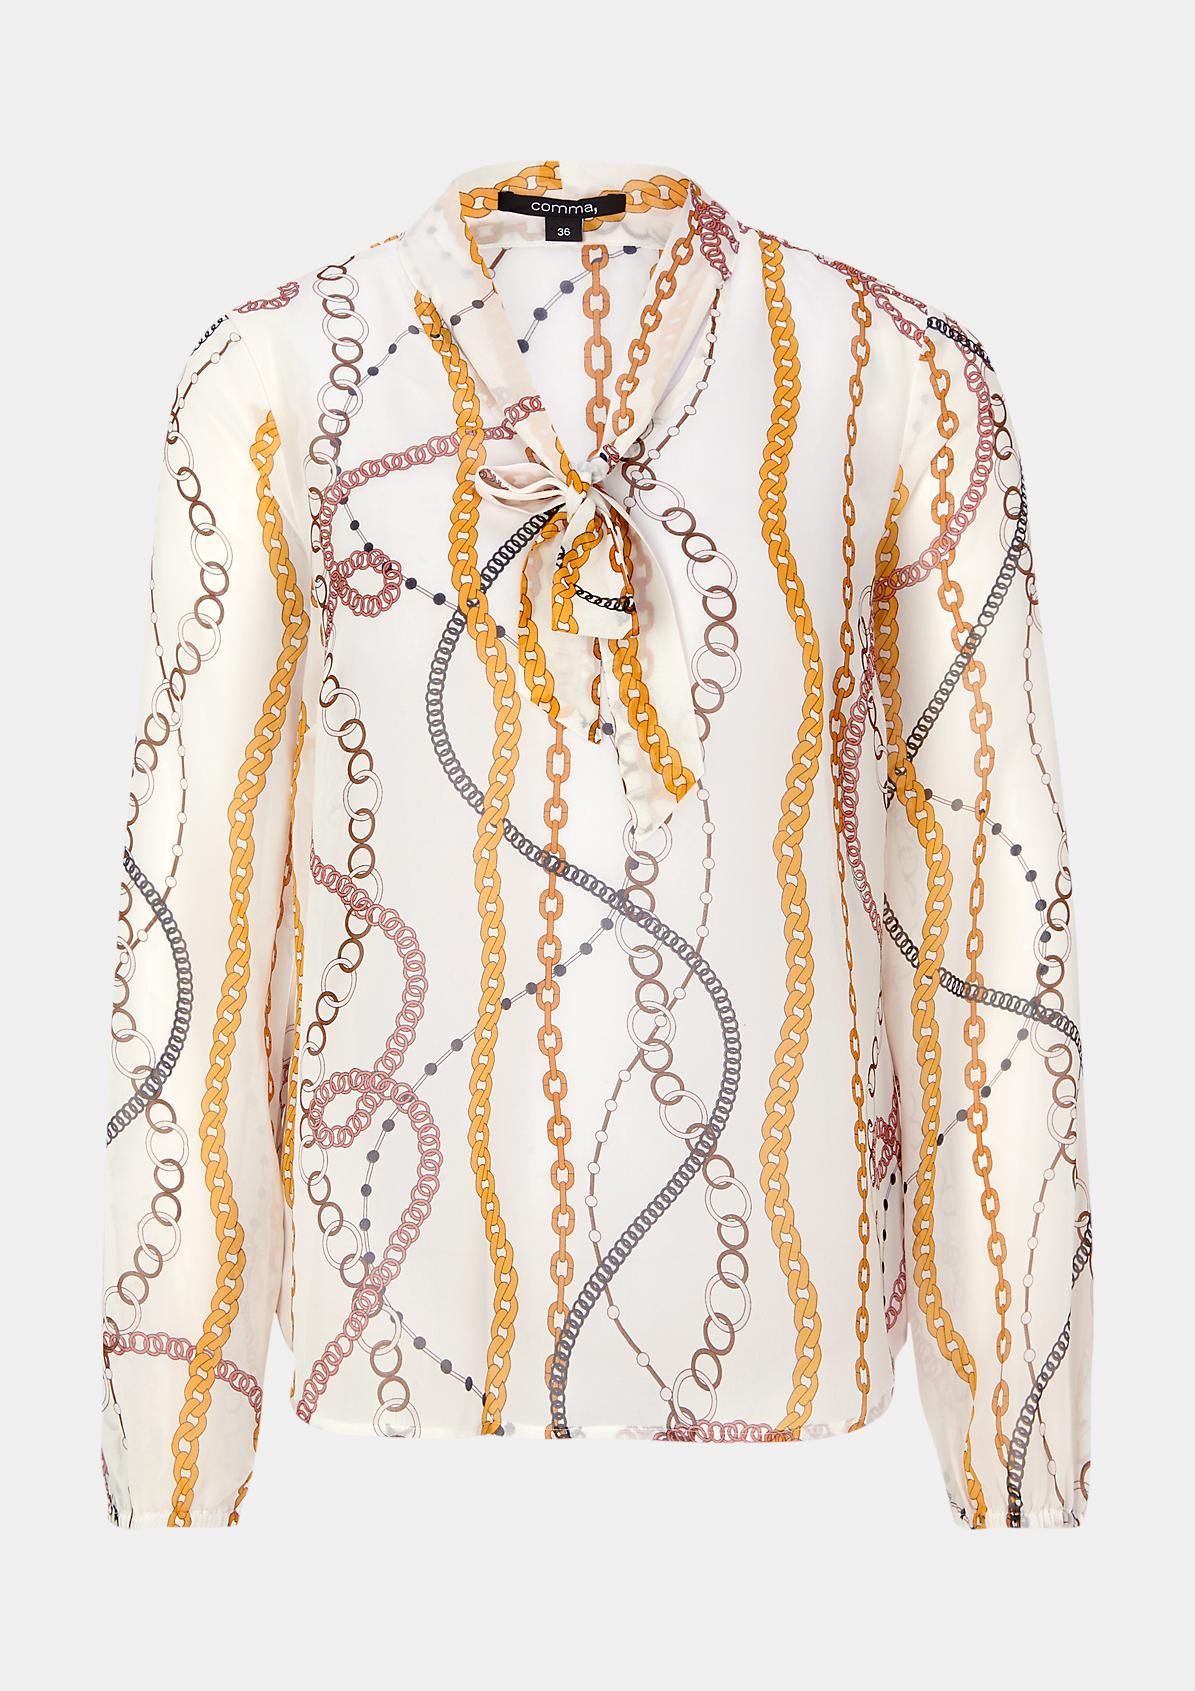 Zarte Langarmbluse mit dekorativem Allovermuster